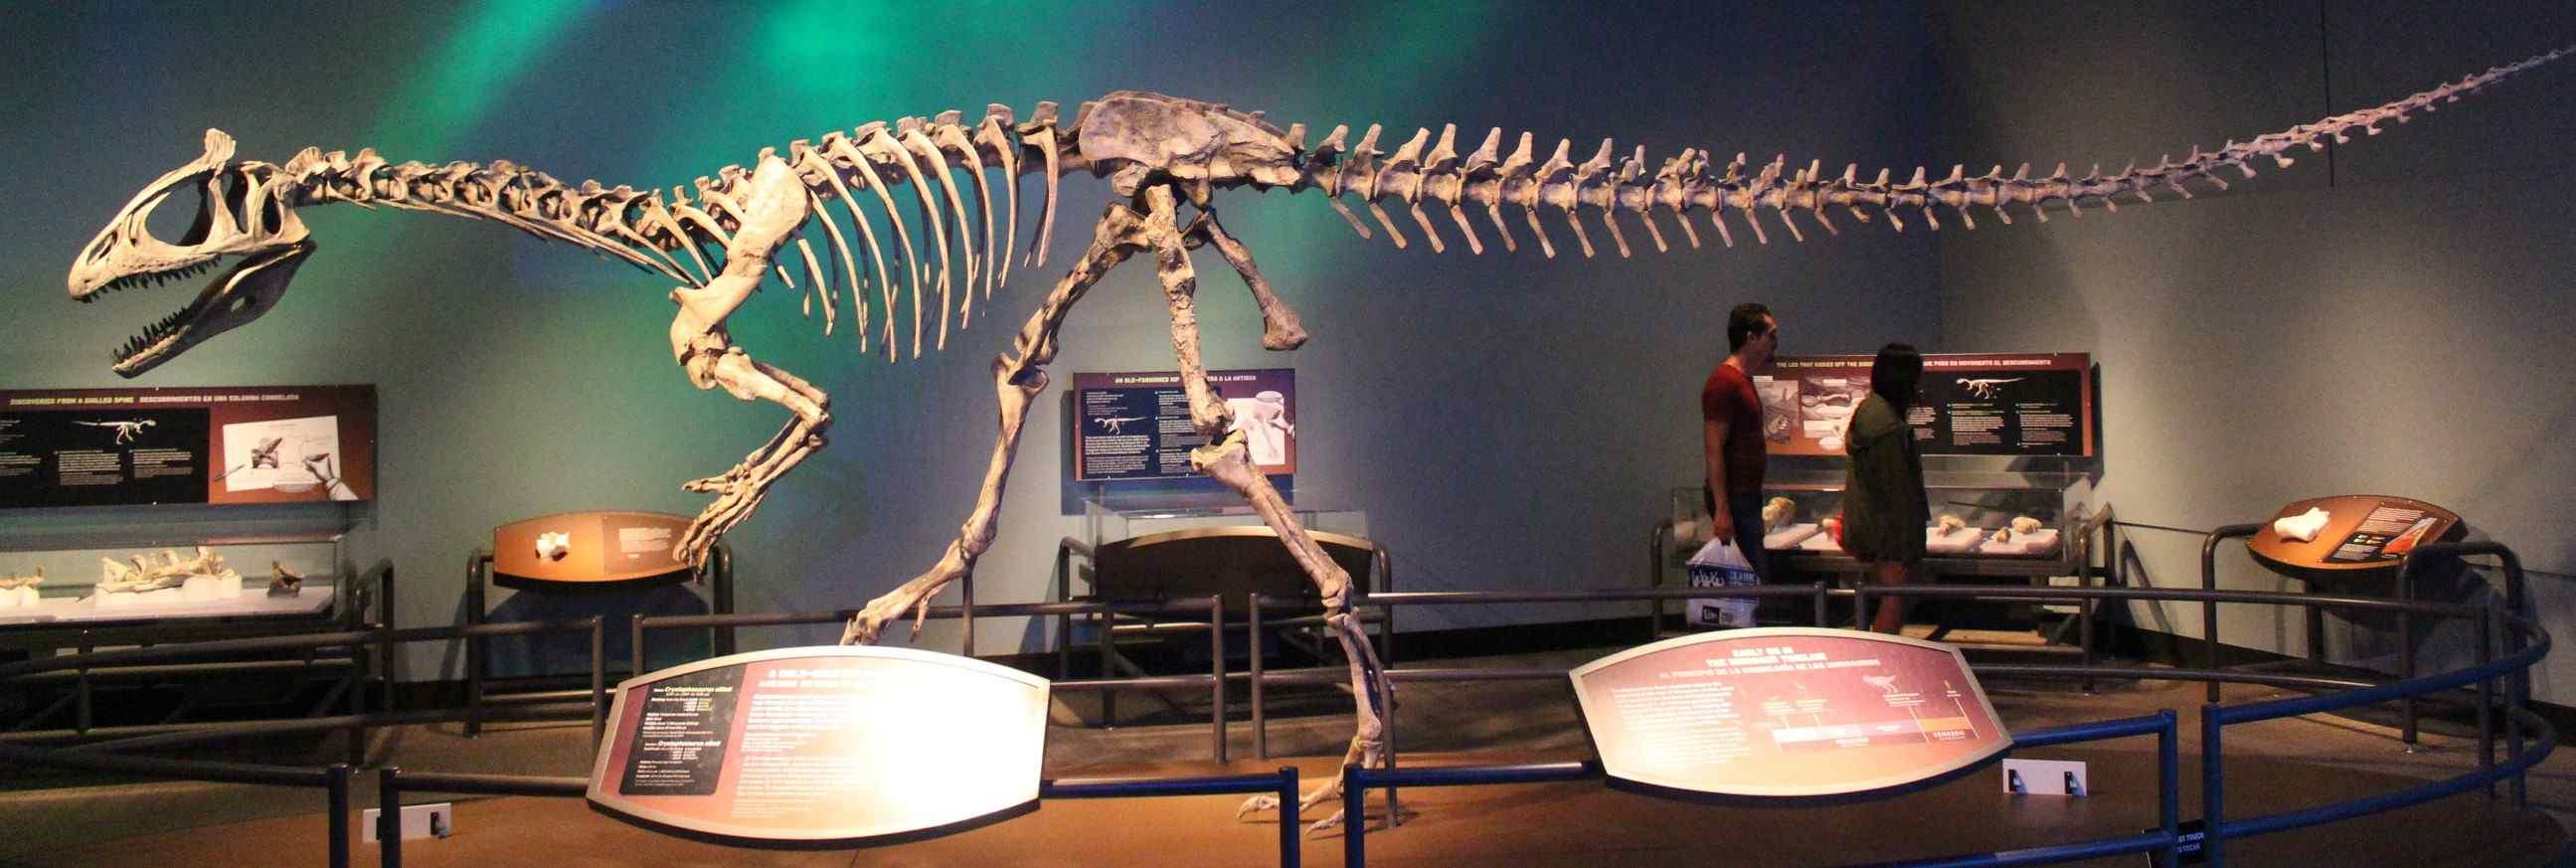 Cryolophosaurus fossil